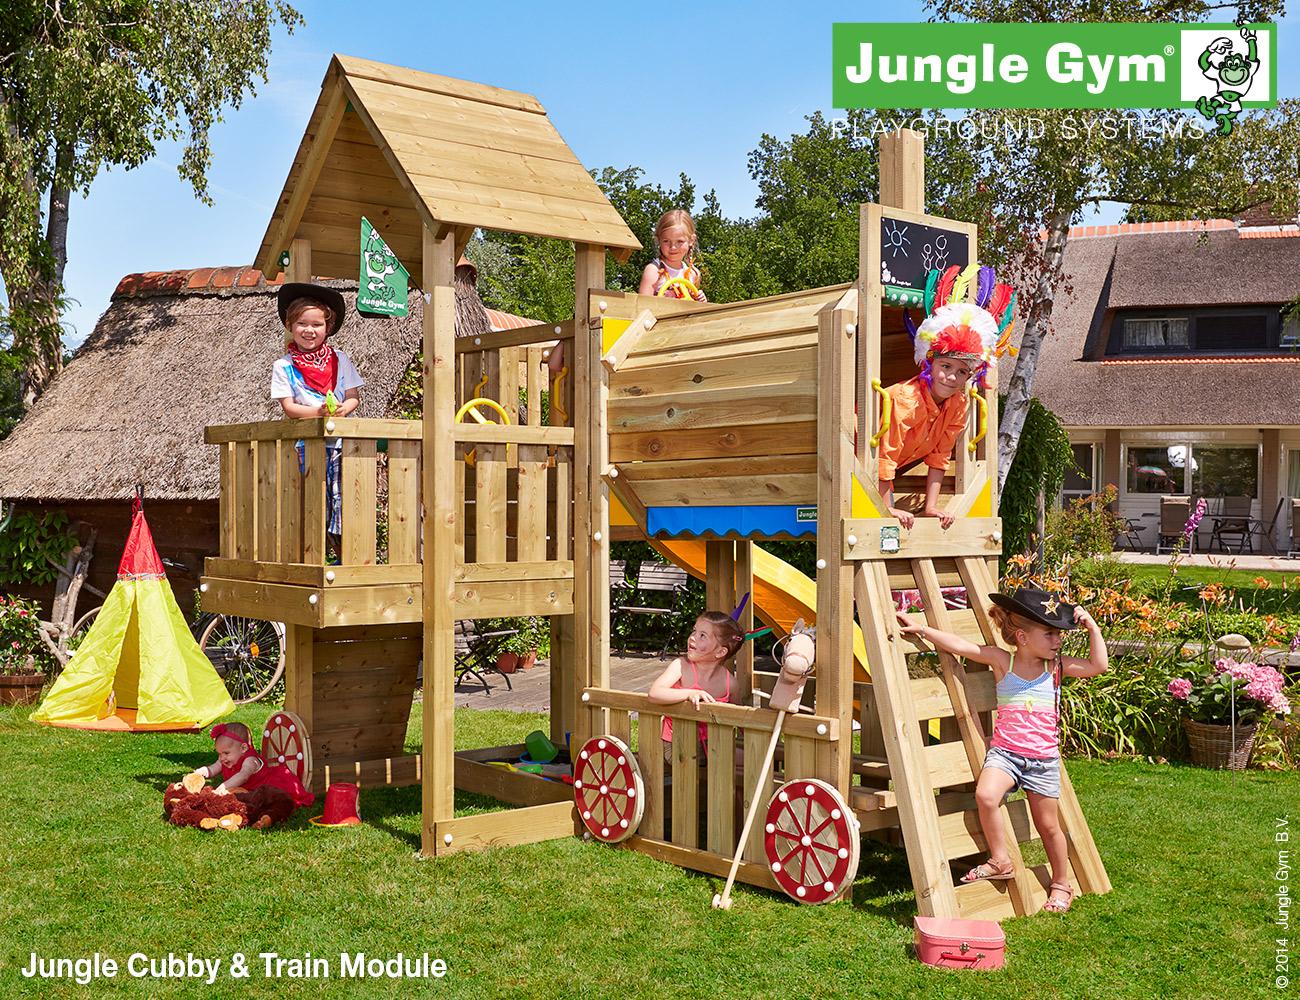 The Jungle Gym \'Cubby Train\' Climbing Frame - Climbing Frame Installer